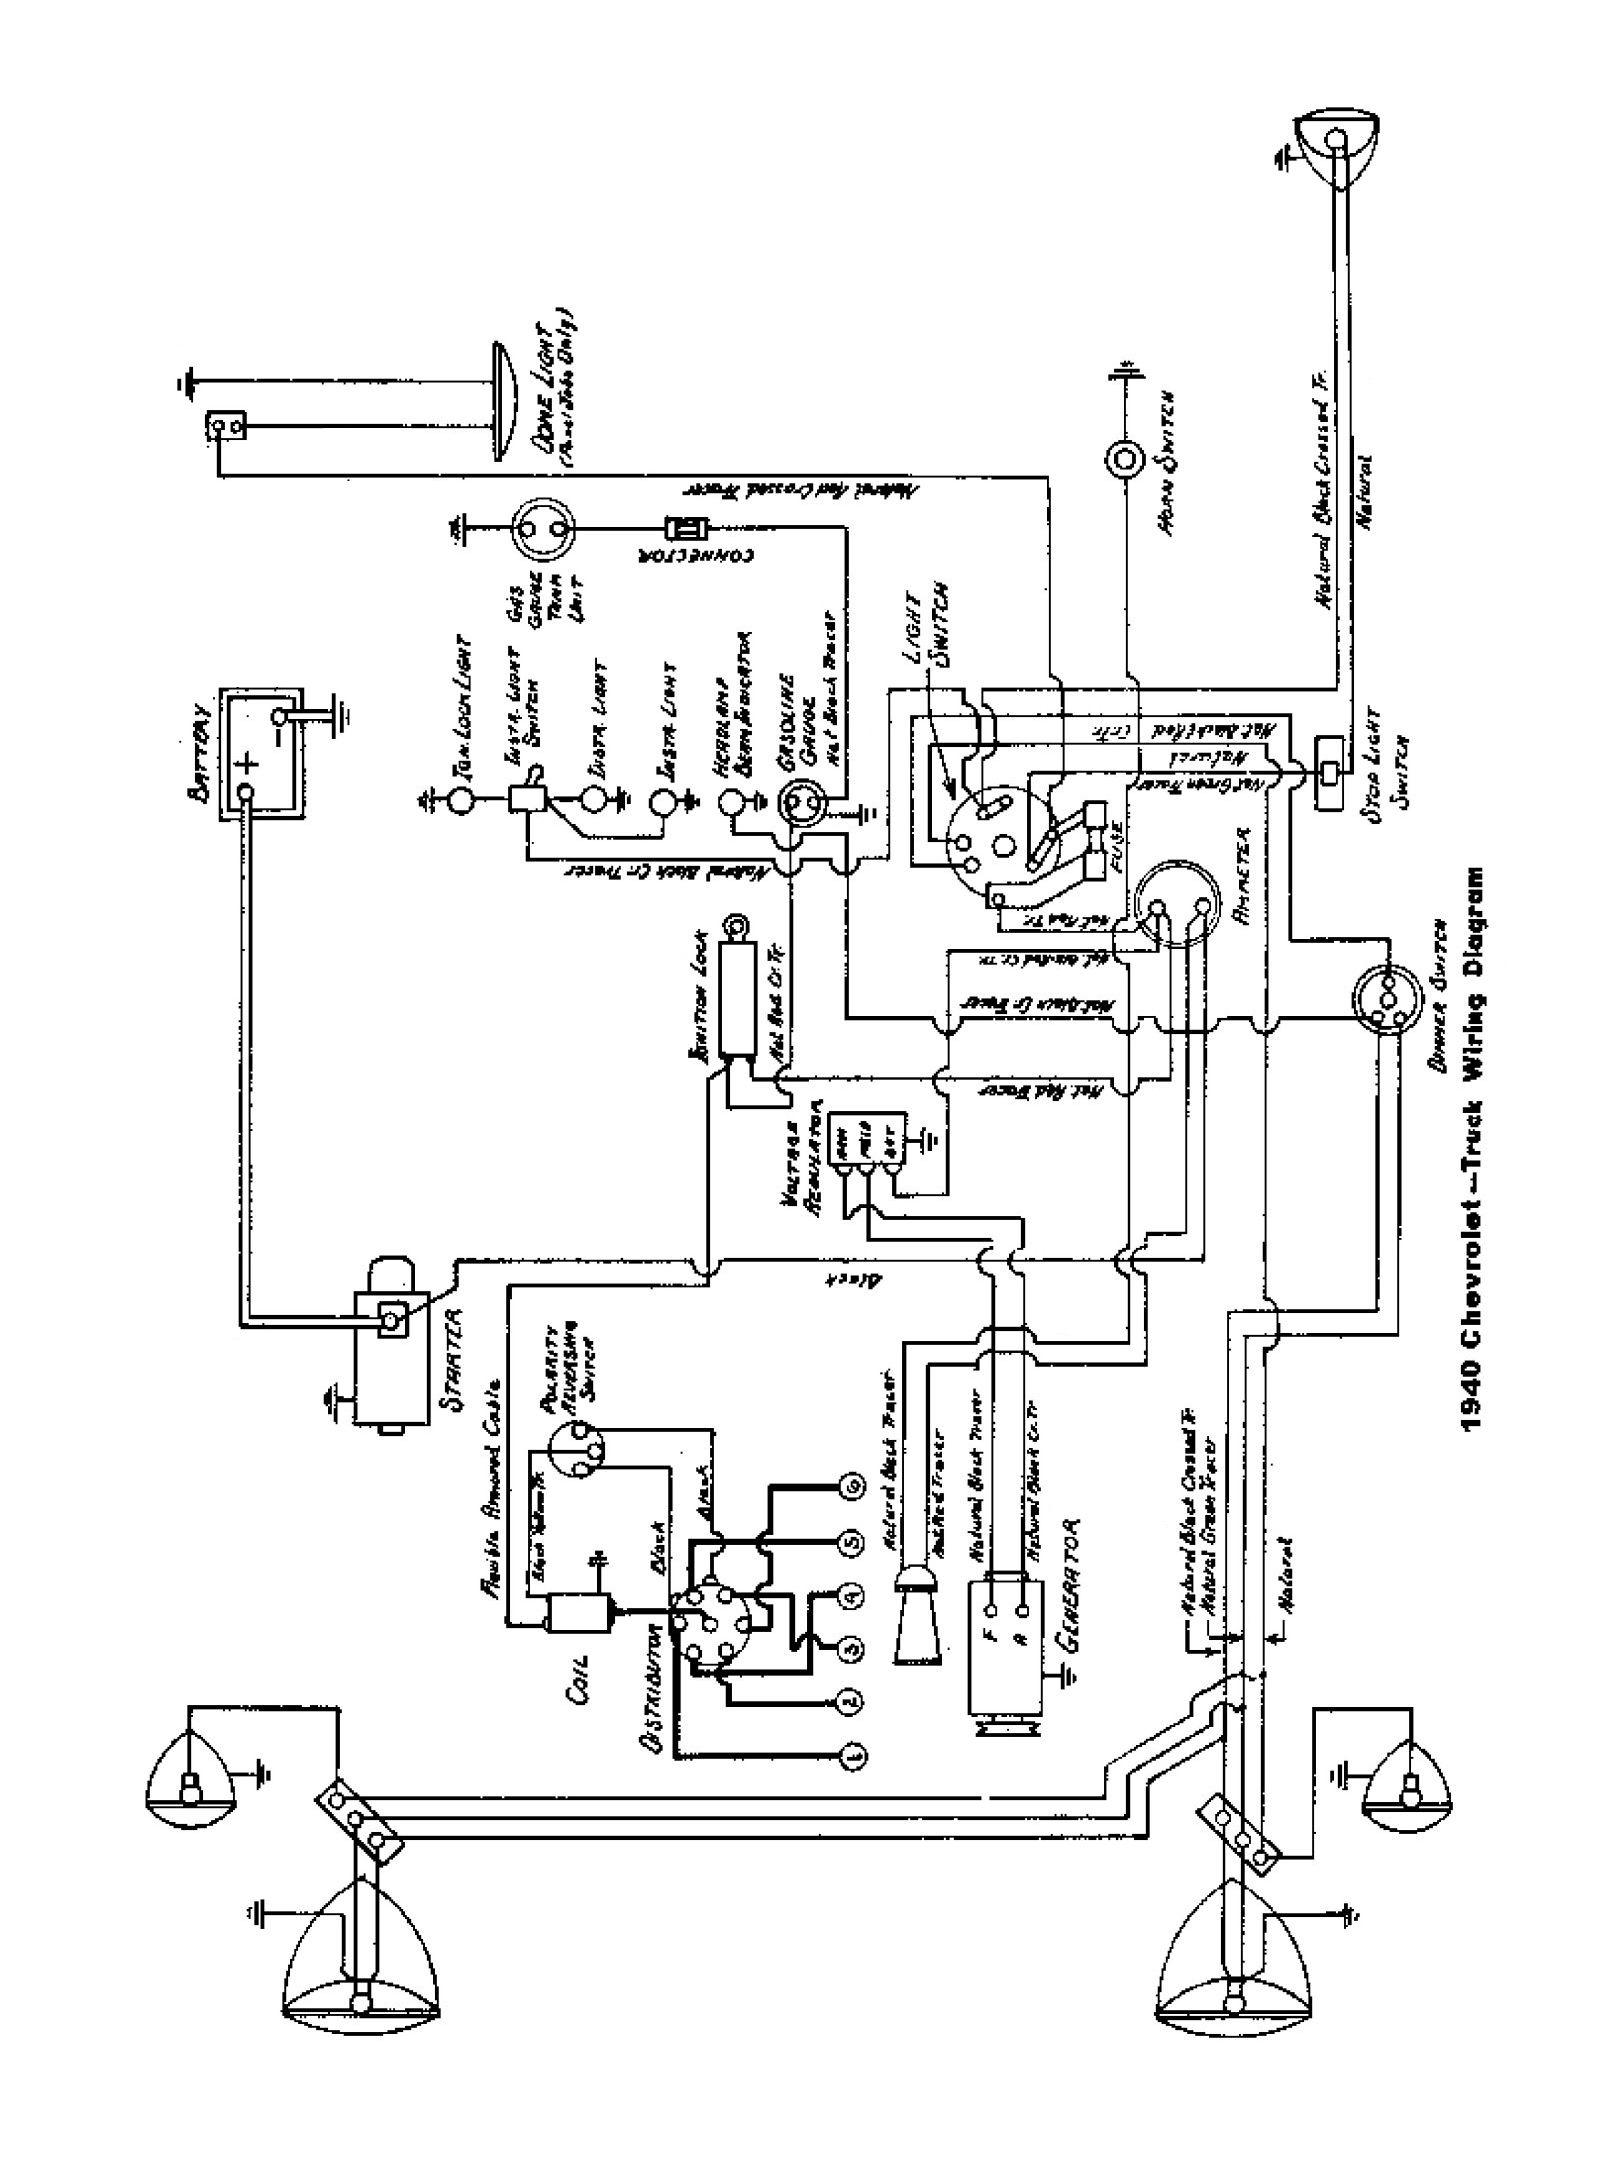 Chevy Pickup Dash Wiring DiagramPickupWiring Diagrams Image - 1972 chevy truck engine wiring harness